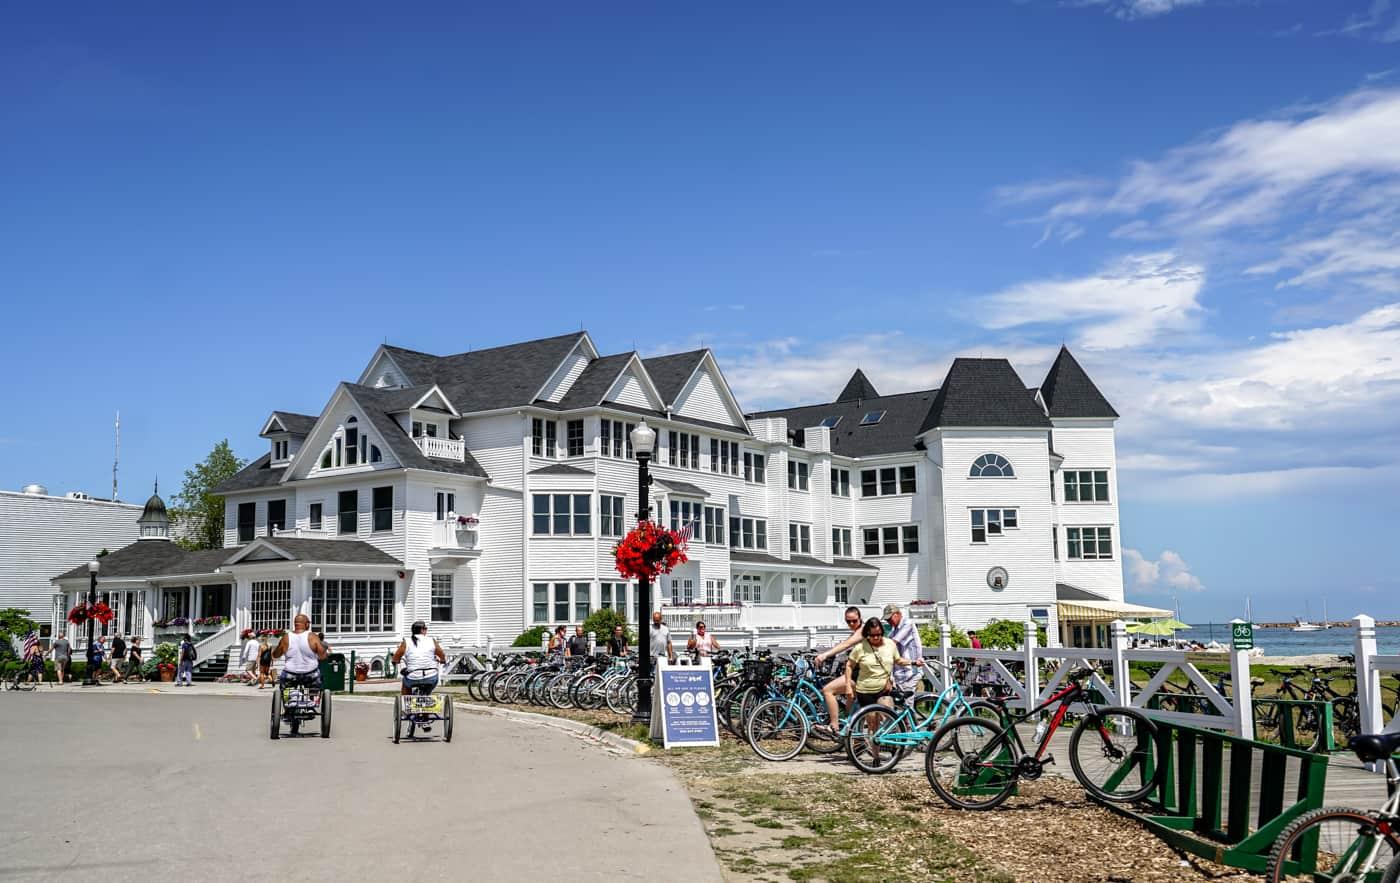 Hotel Iroquois on Mackinc Island Michigan